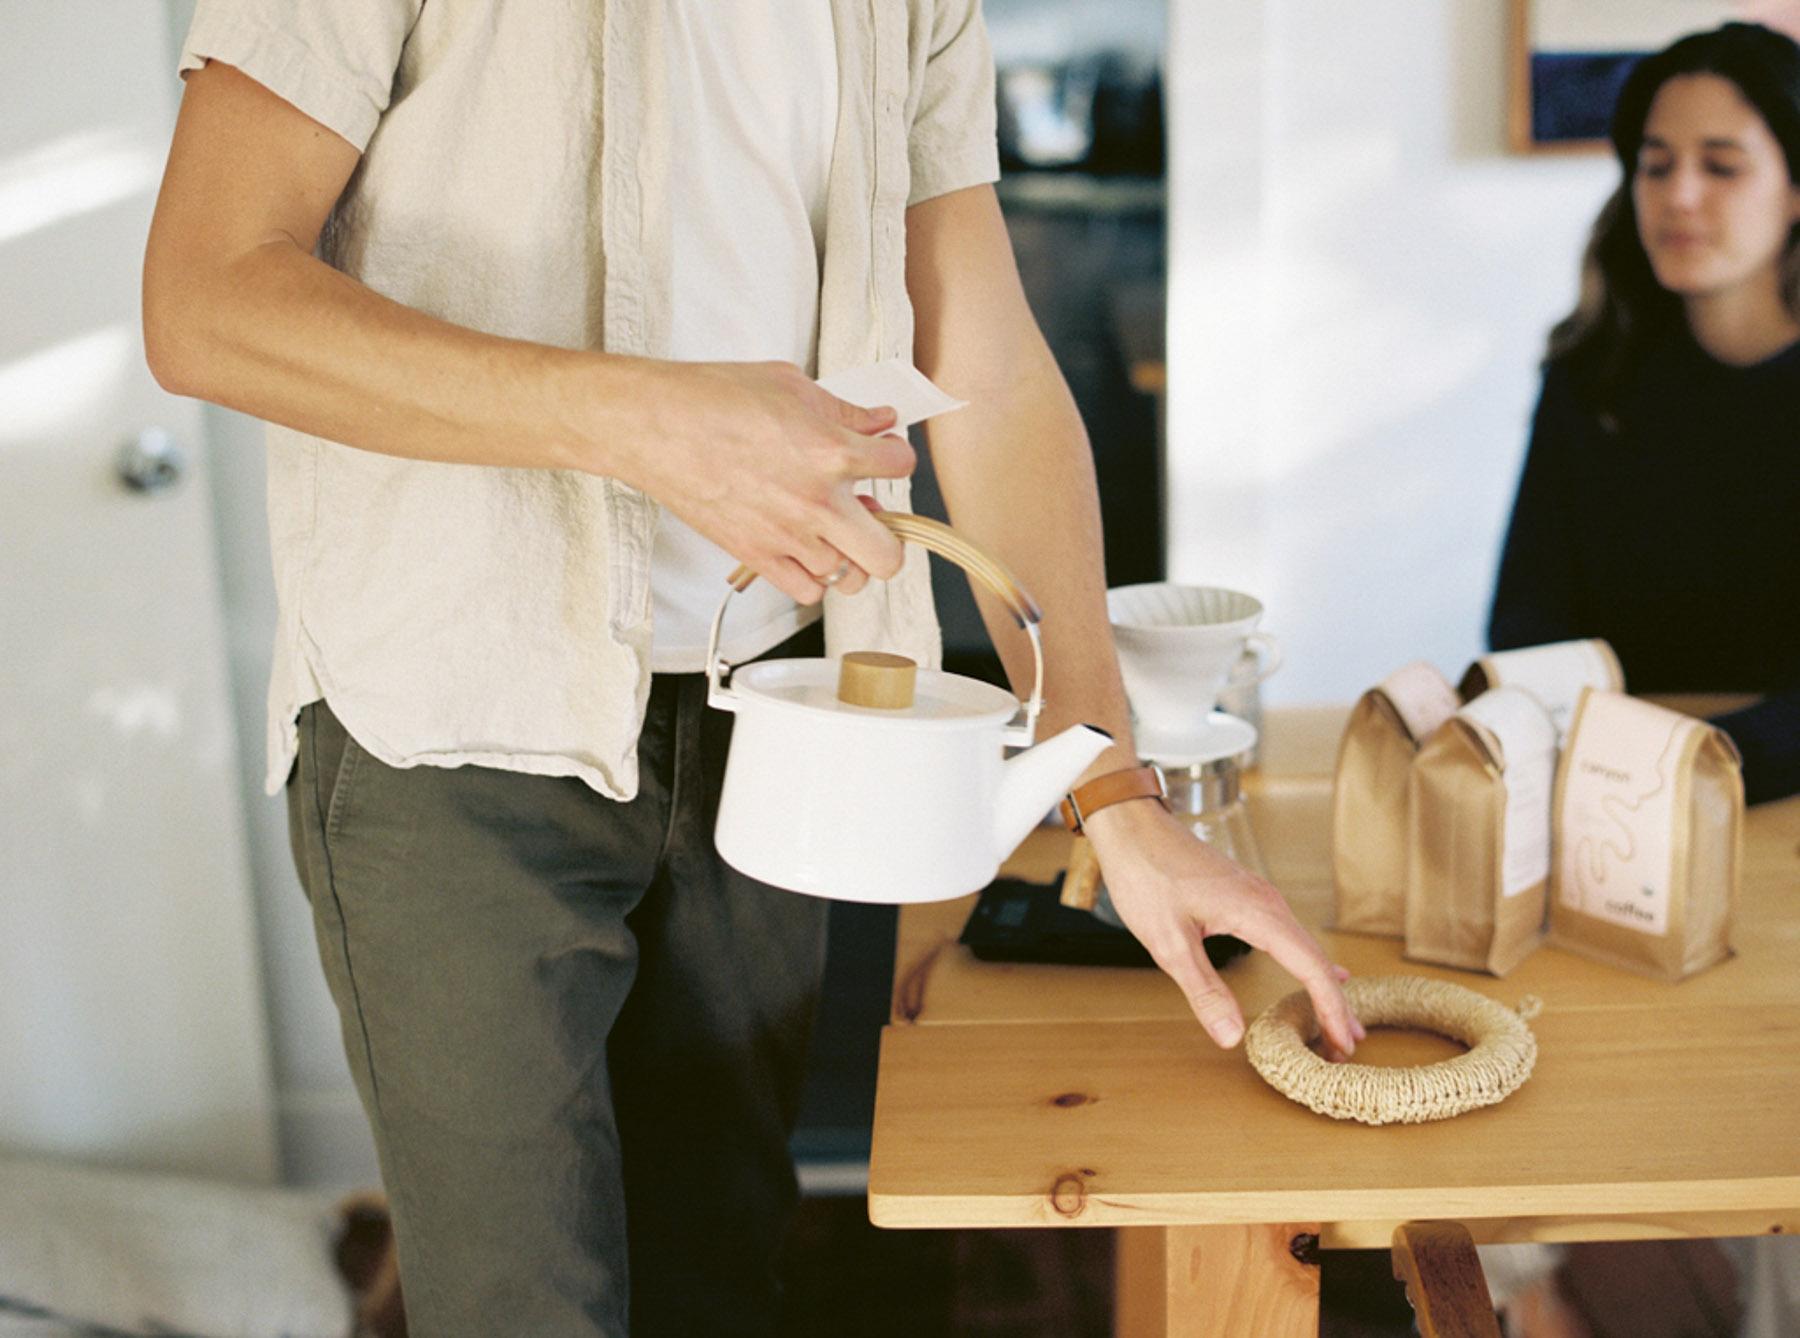 Justin Chung, Canyon Coffee, Kodak